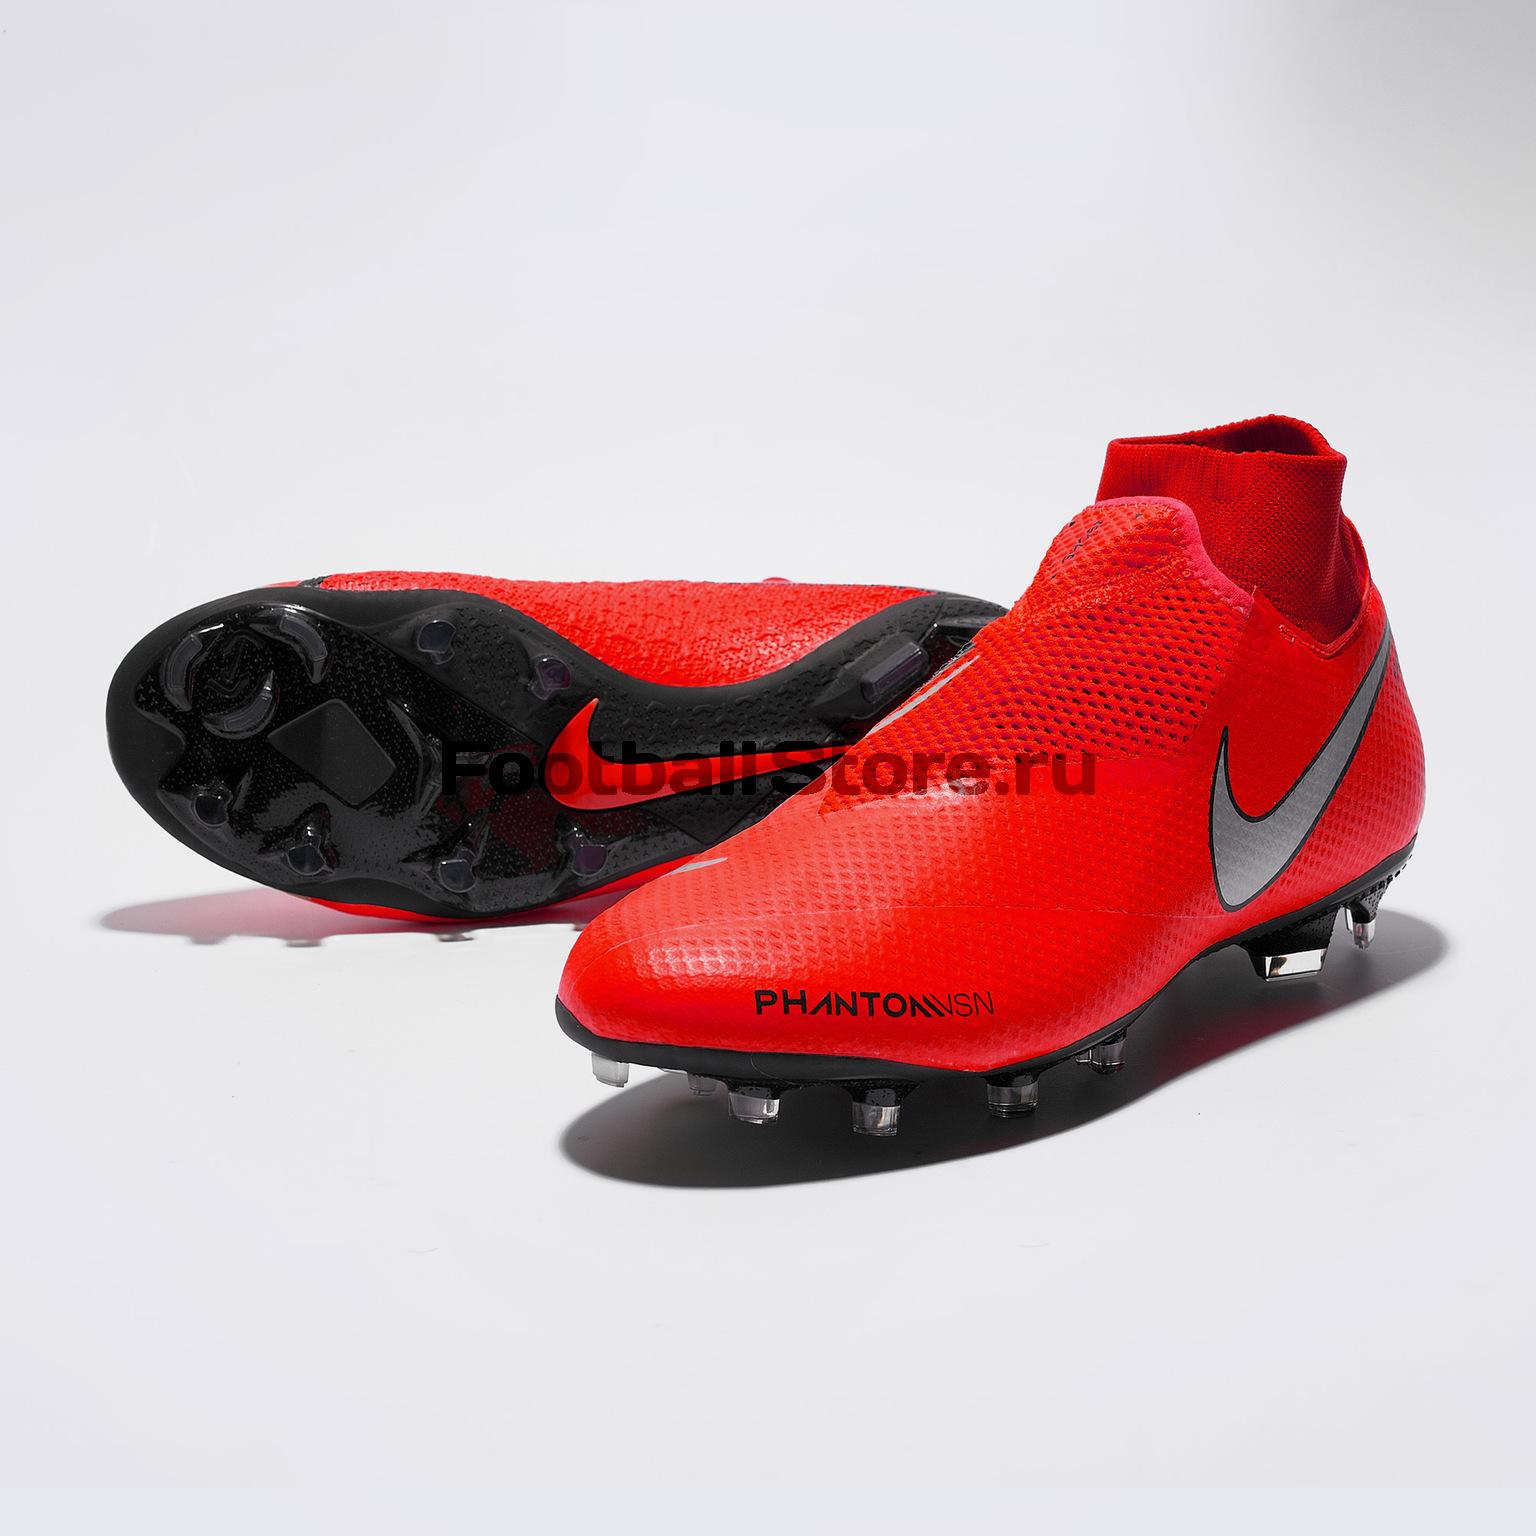 f4f81abf Бутсы Nike Phantom 3 Pro DF FG AO3266-600 – купить бутсы в интернет ...